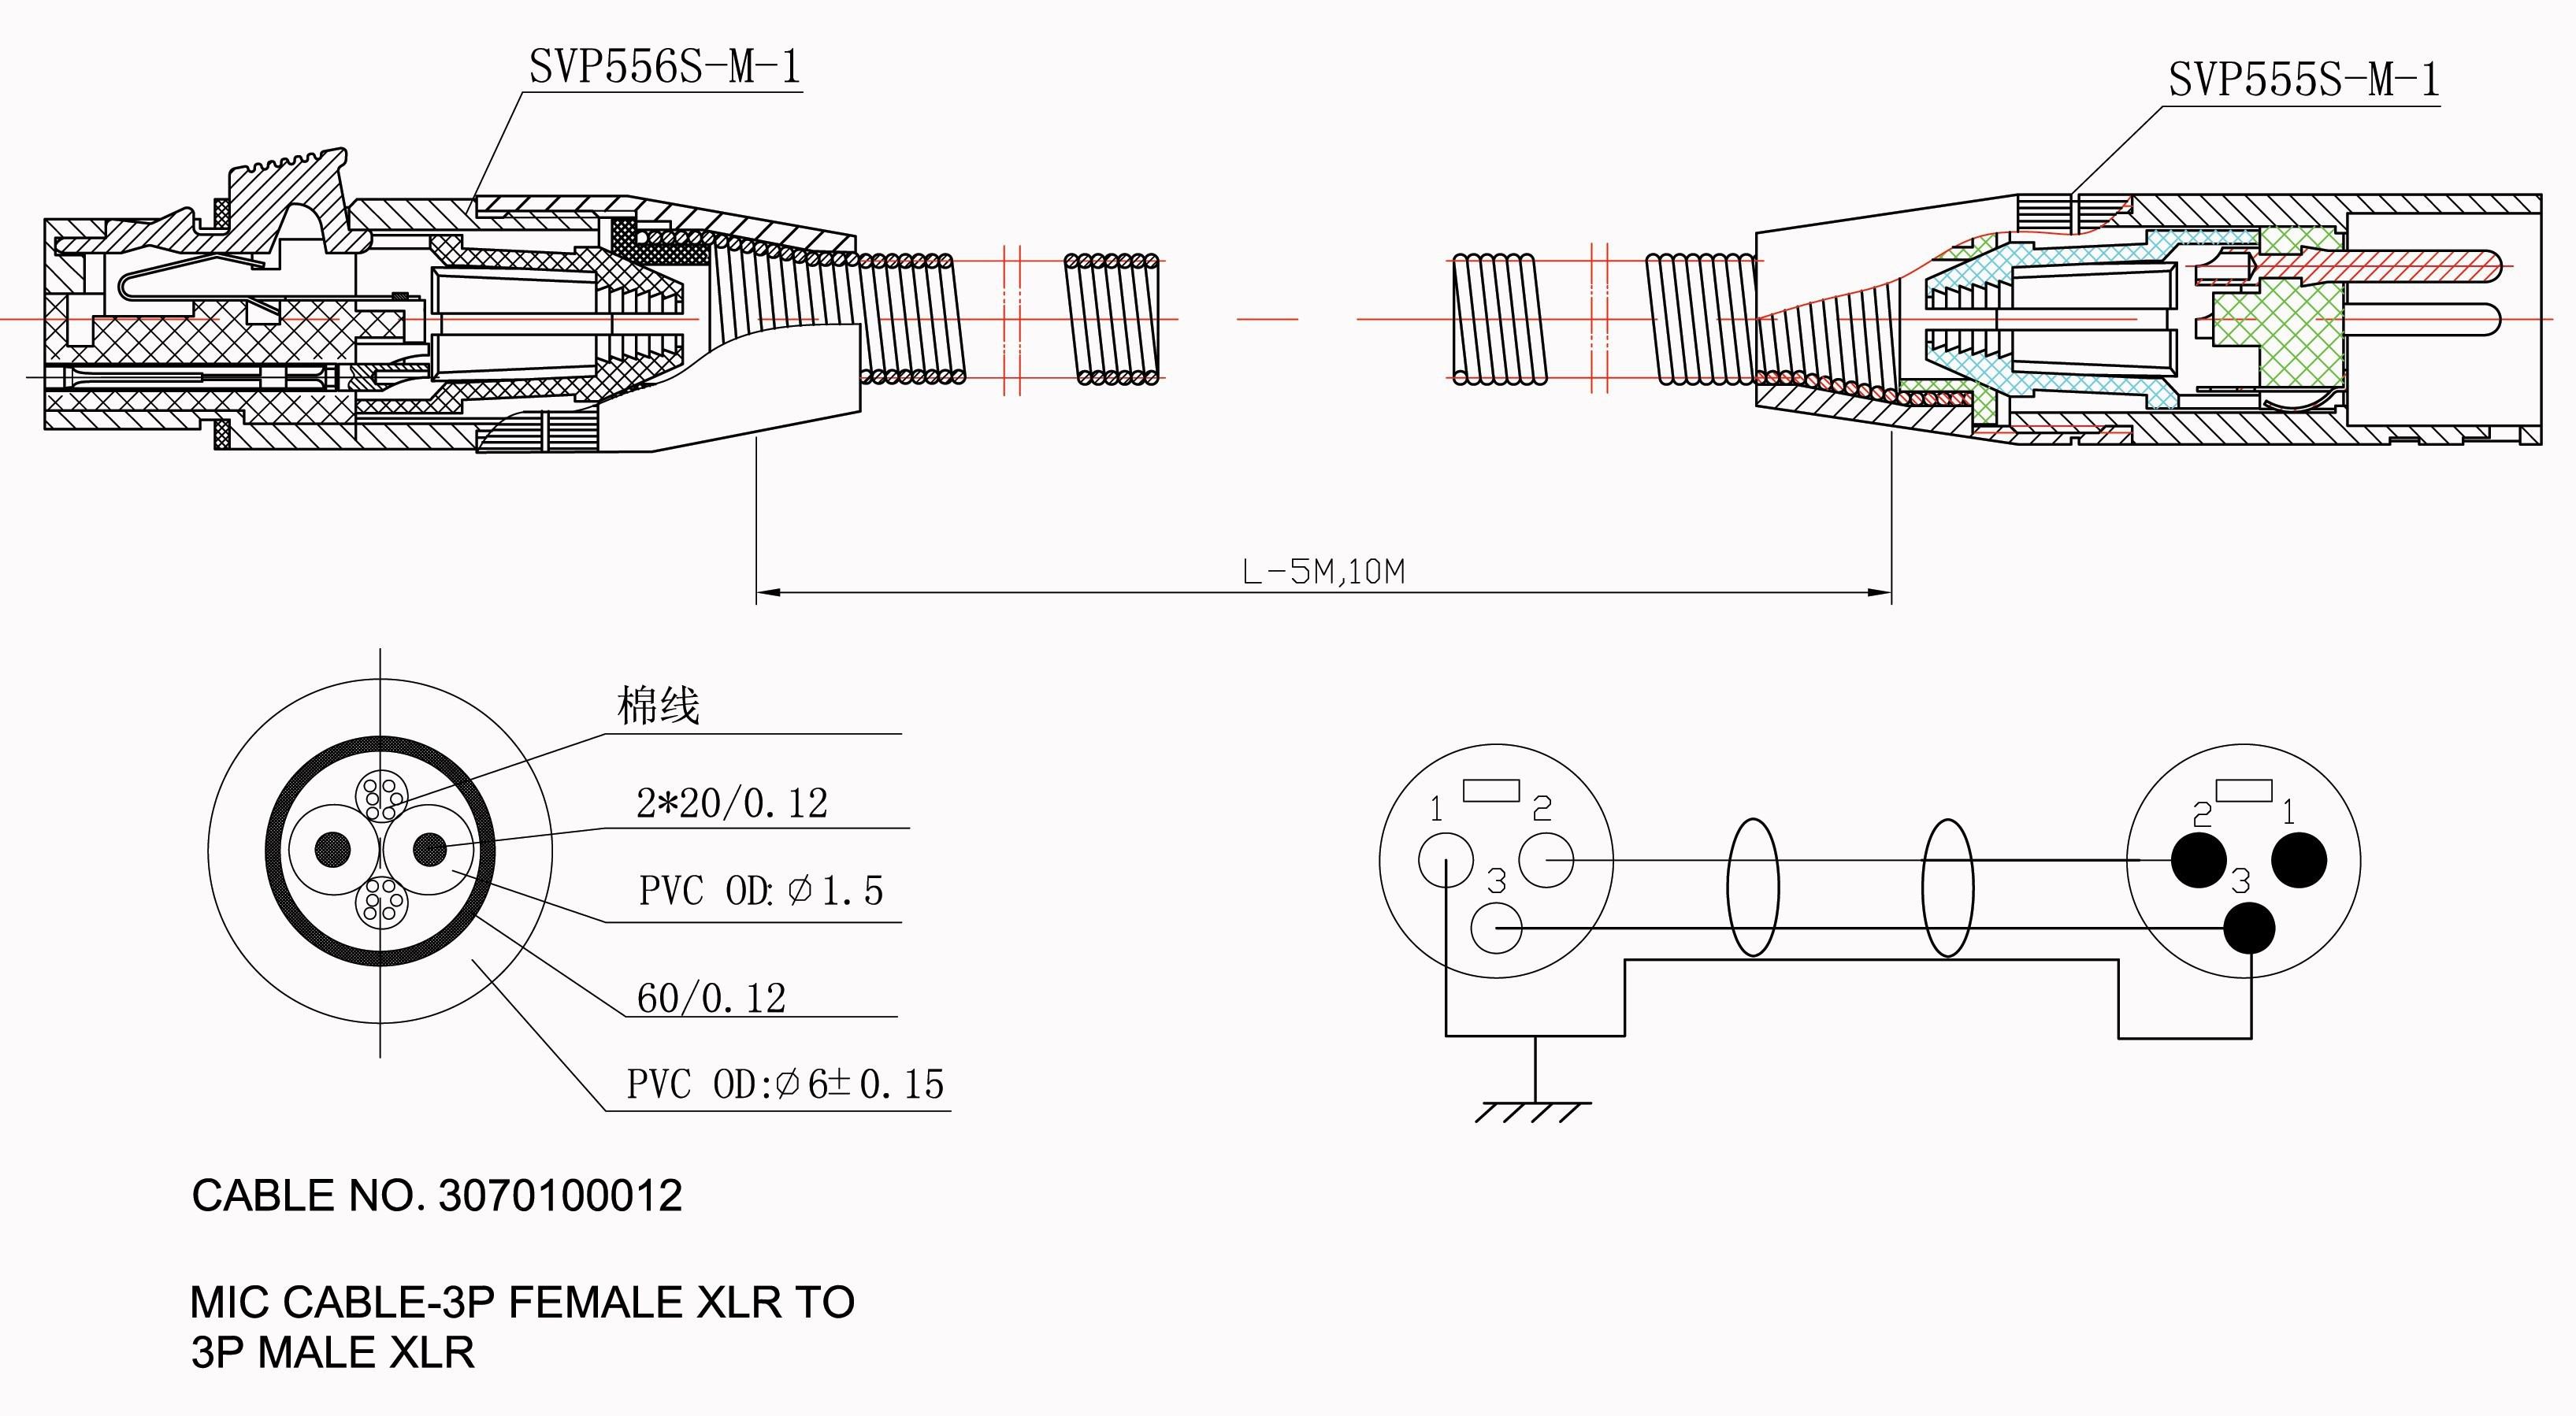 Automotive Electrical Wiring Diagram - Wiring Diagram In Series Print Wiring Diagram Basic Car New Automotive Electrical Wiring Diagrams 6n